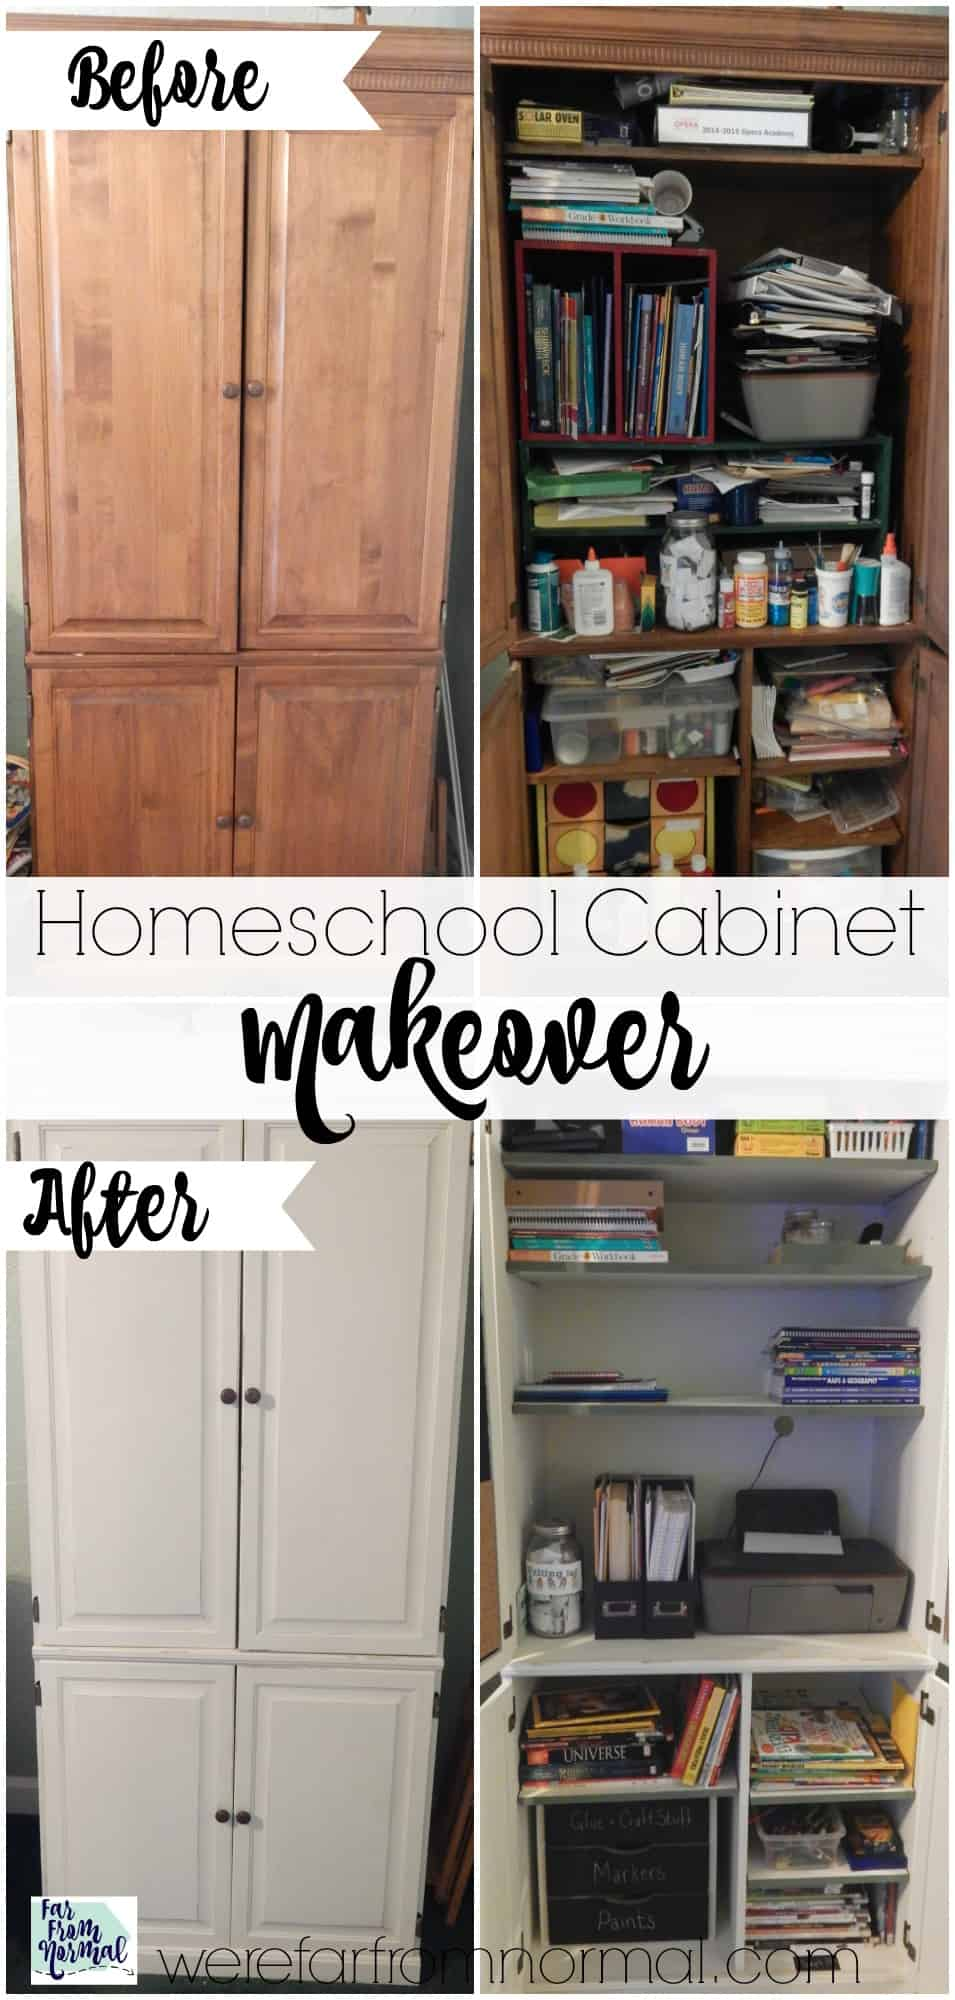 My Homeschool Cabinet Makeover